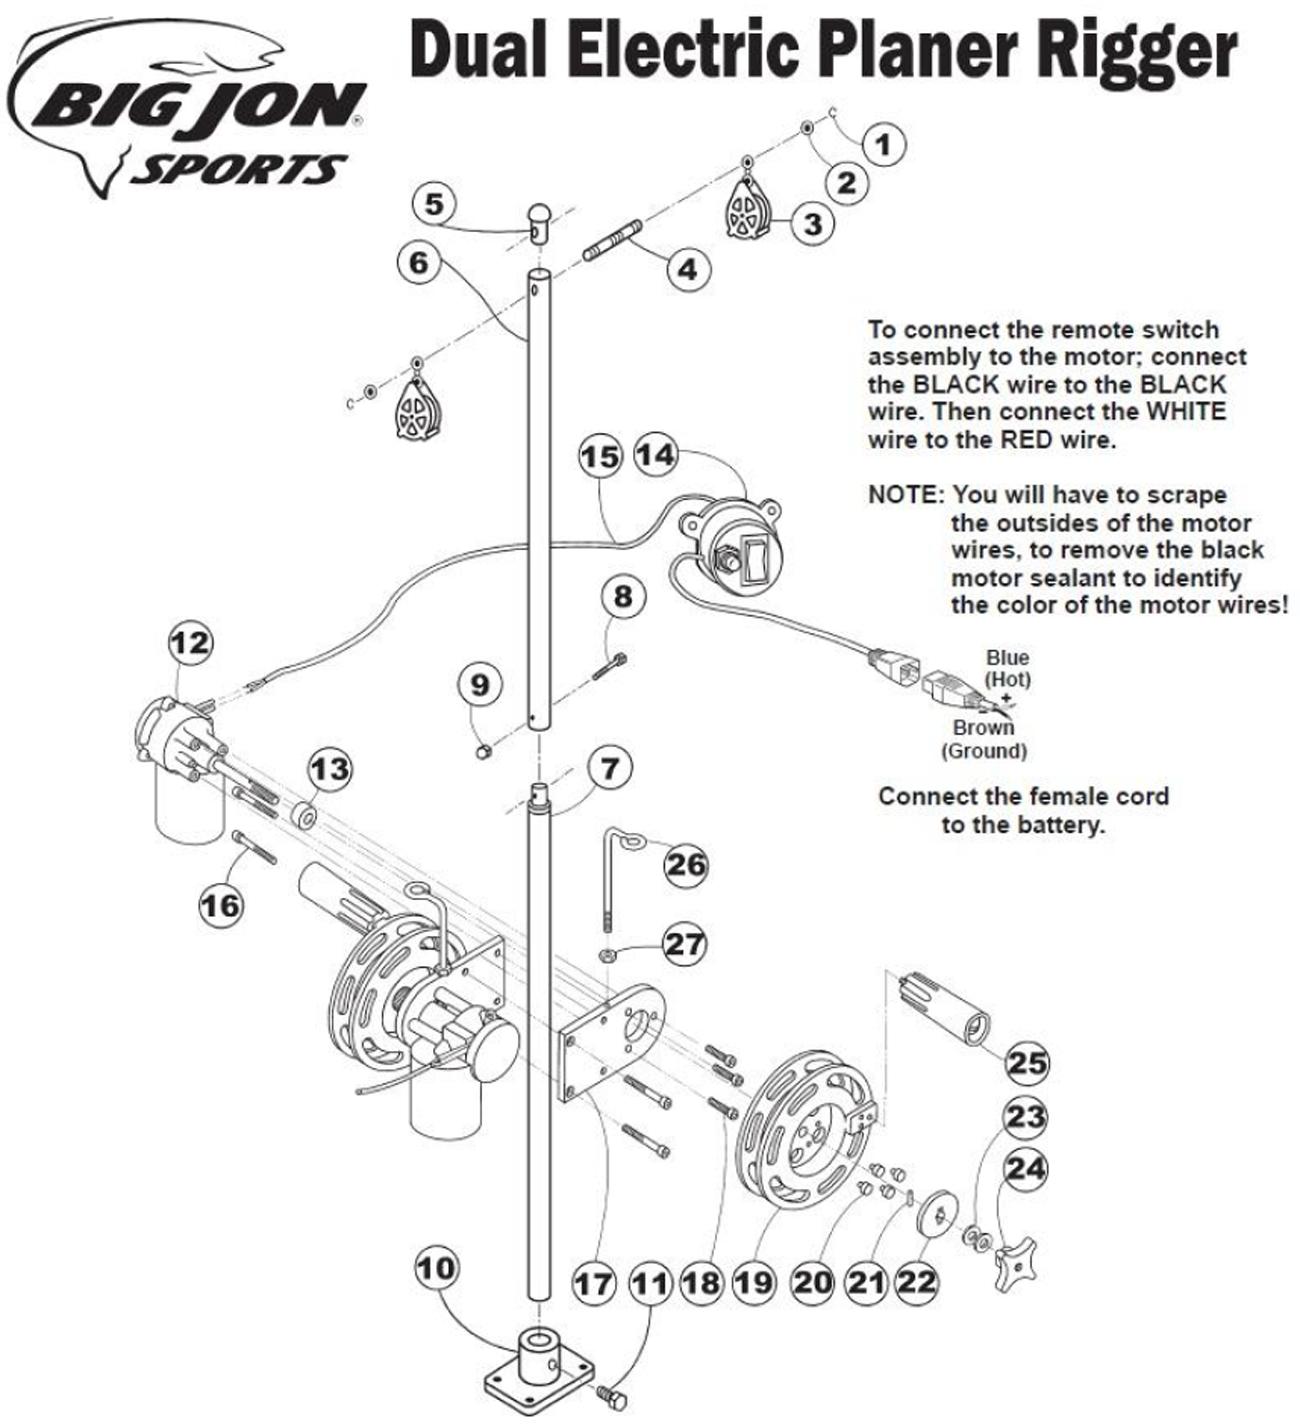 order big jon dual electric planer rigger parts online